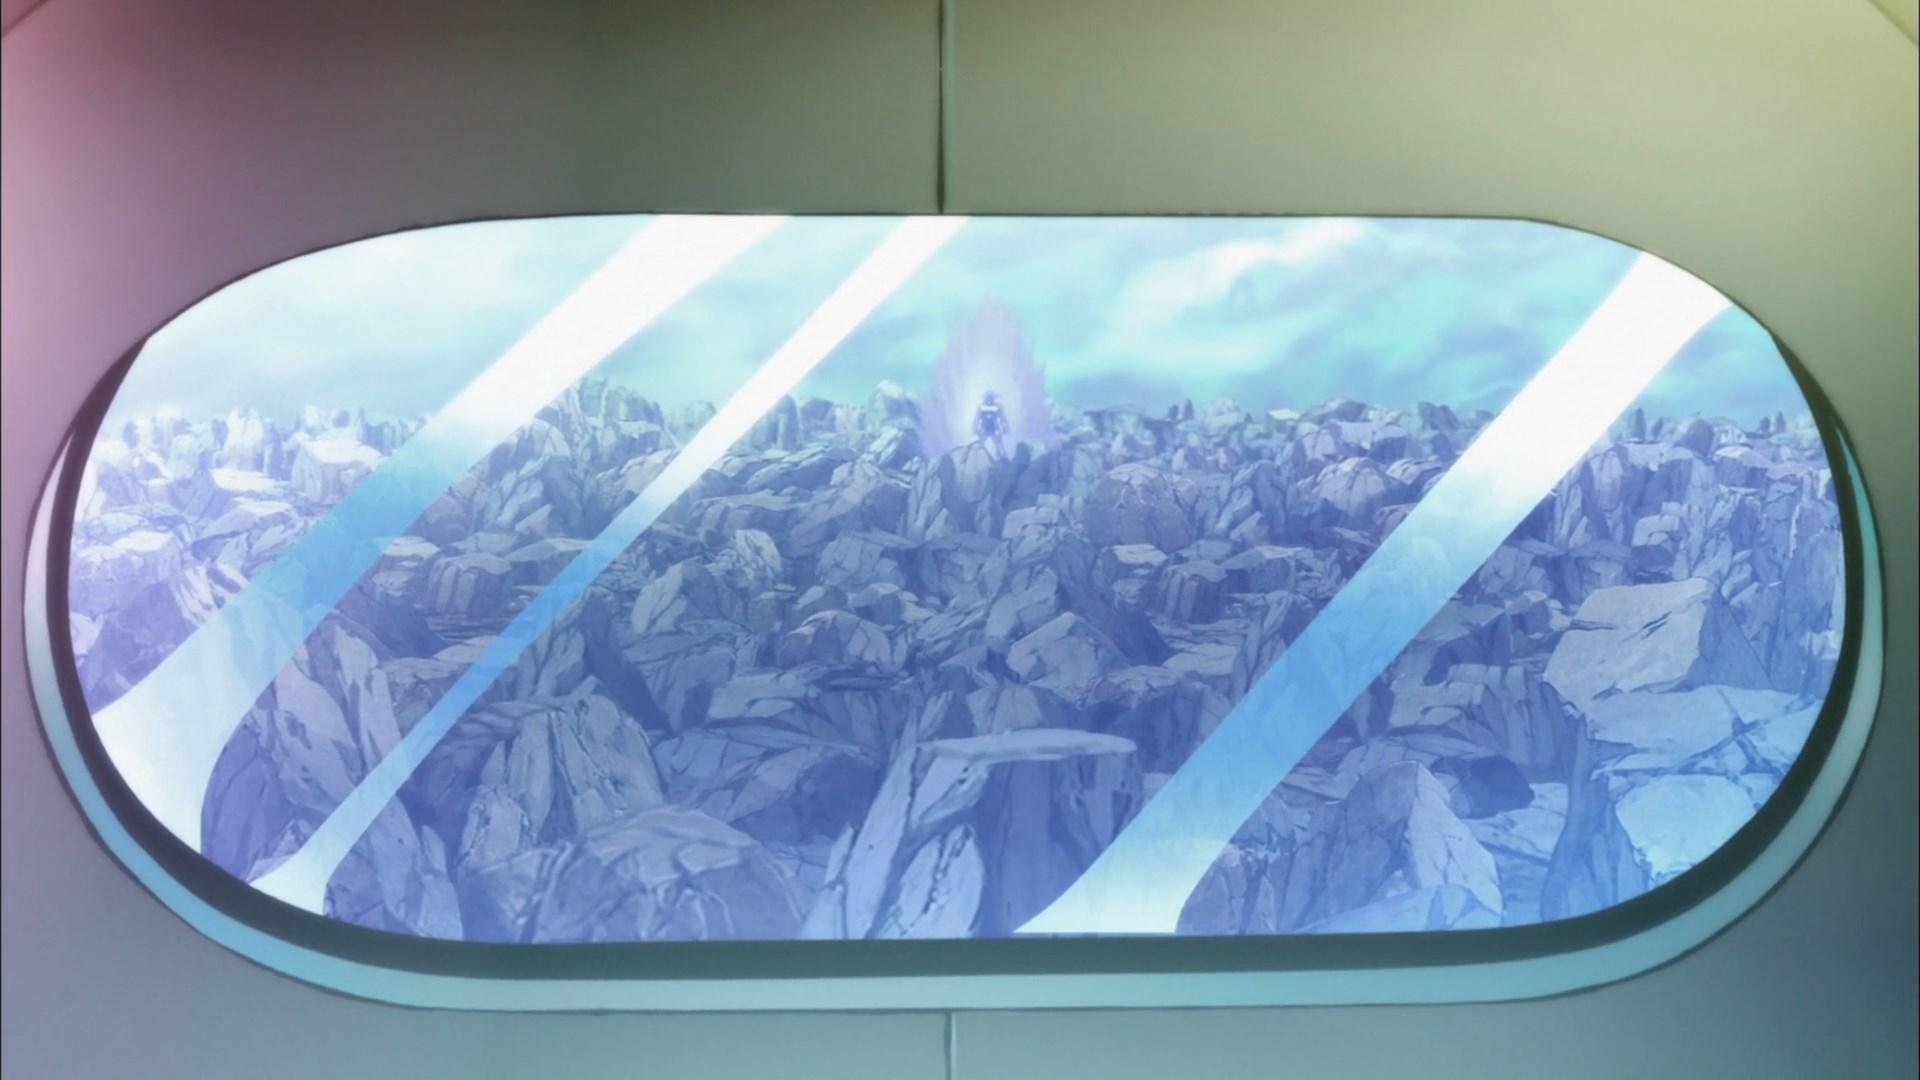 [HorribleSubs] Dragon Ball Super - 121 [1080p].mkv_snapshot_06.03